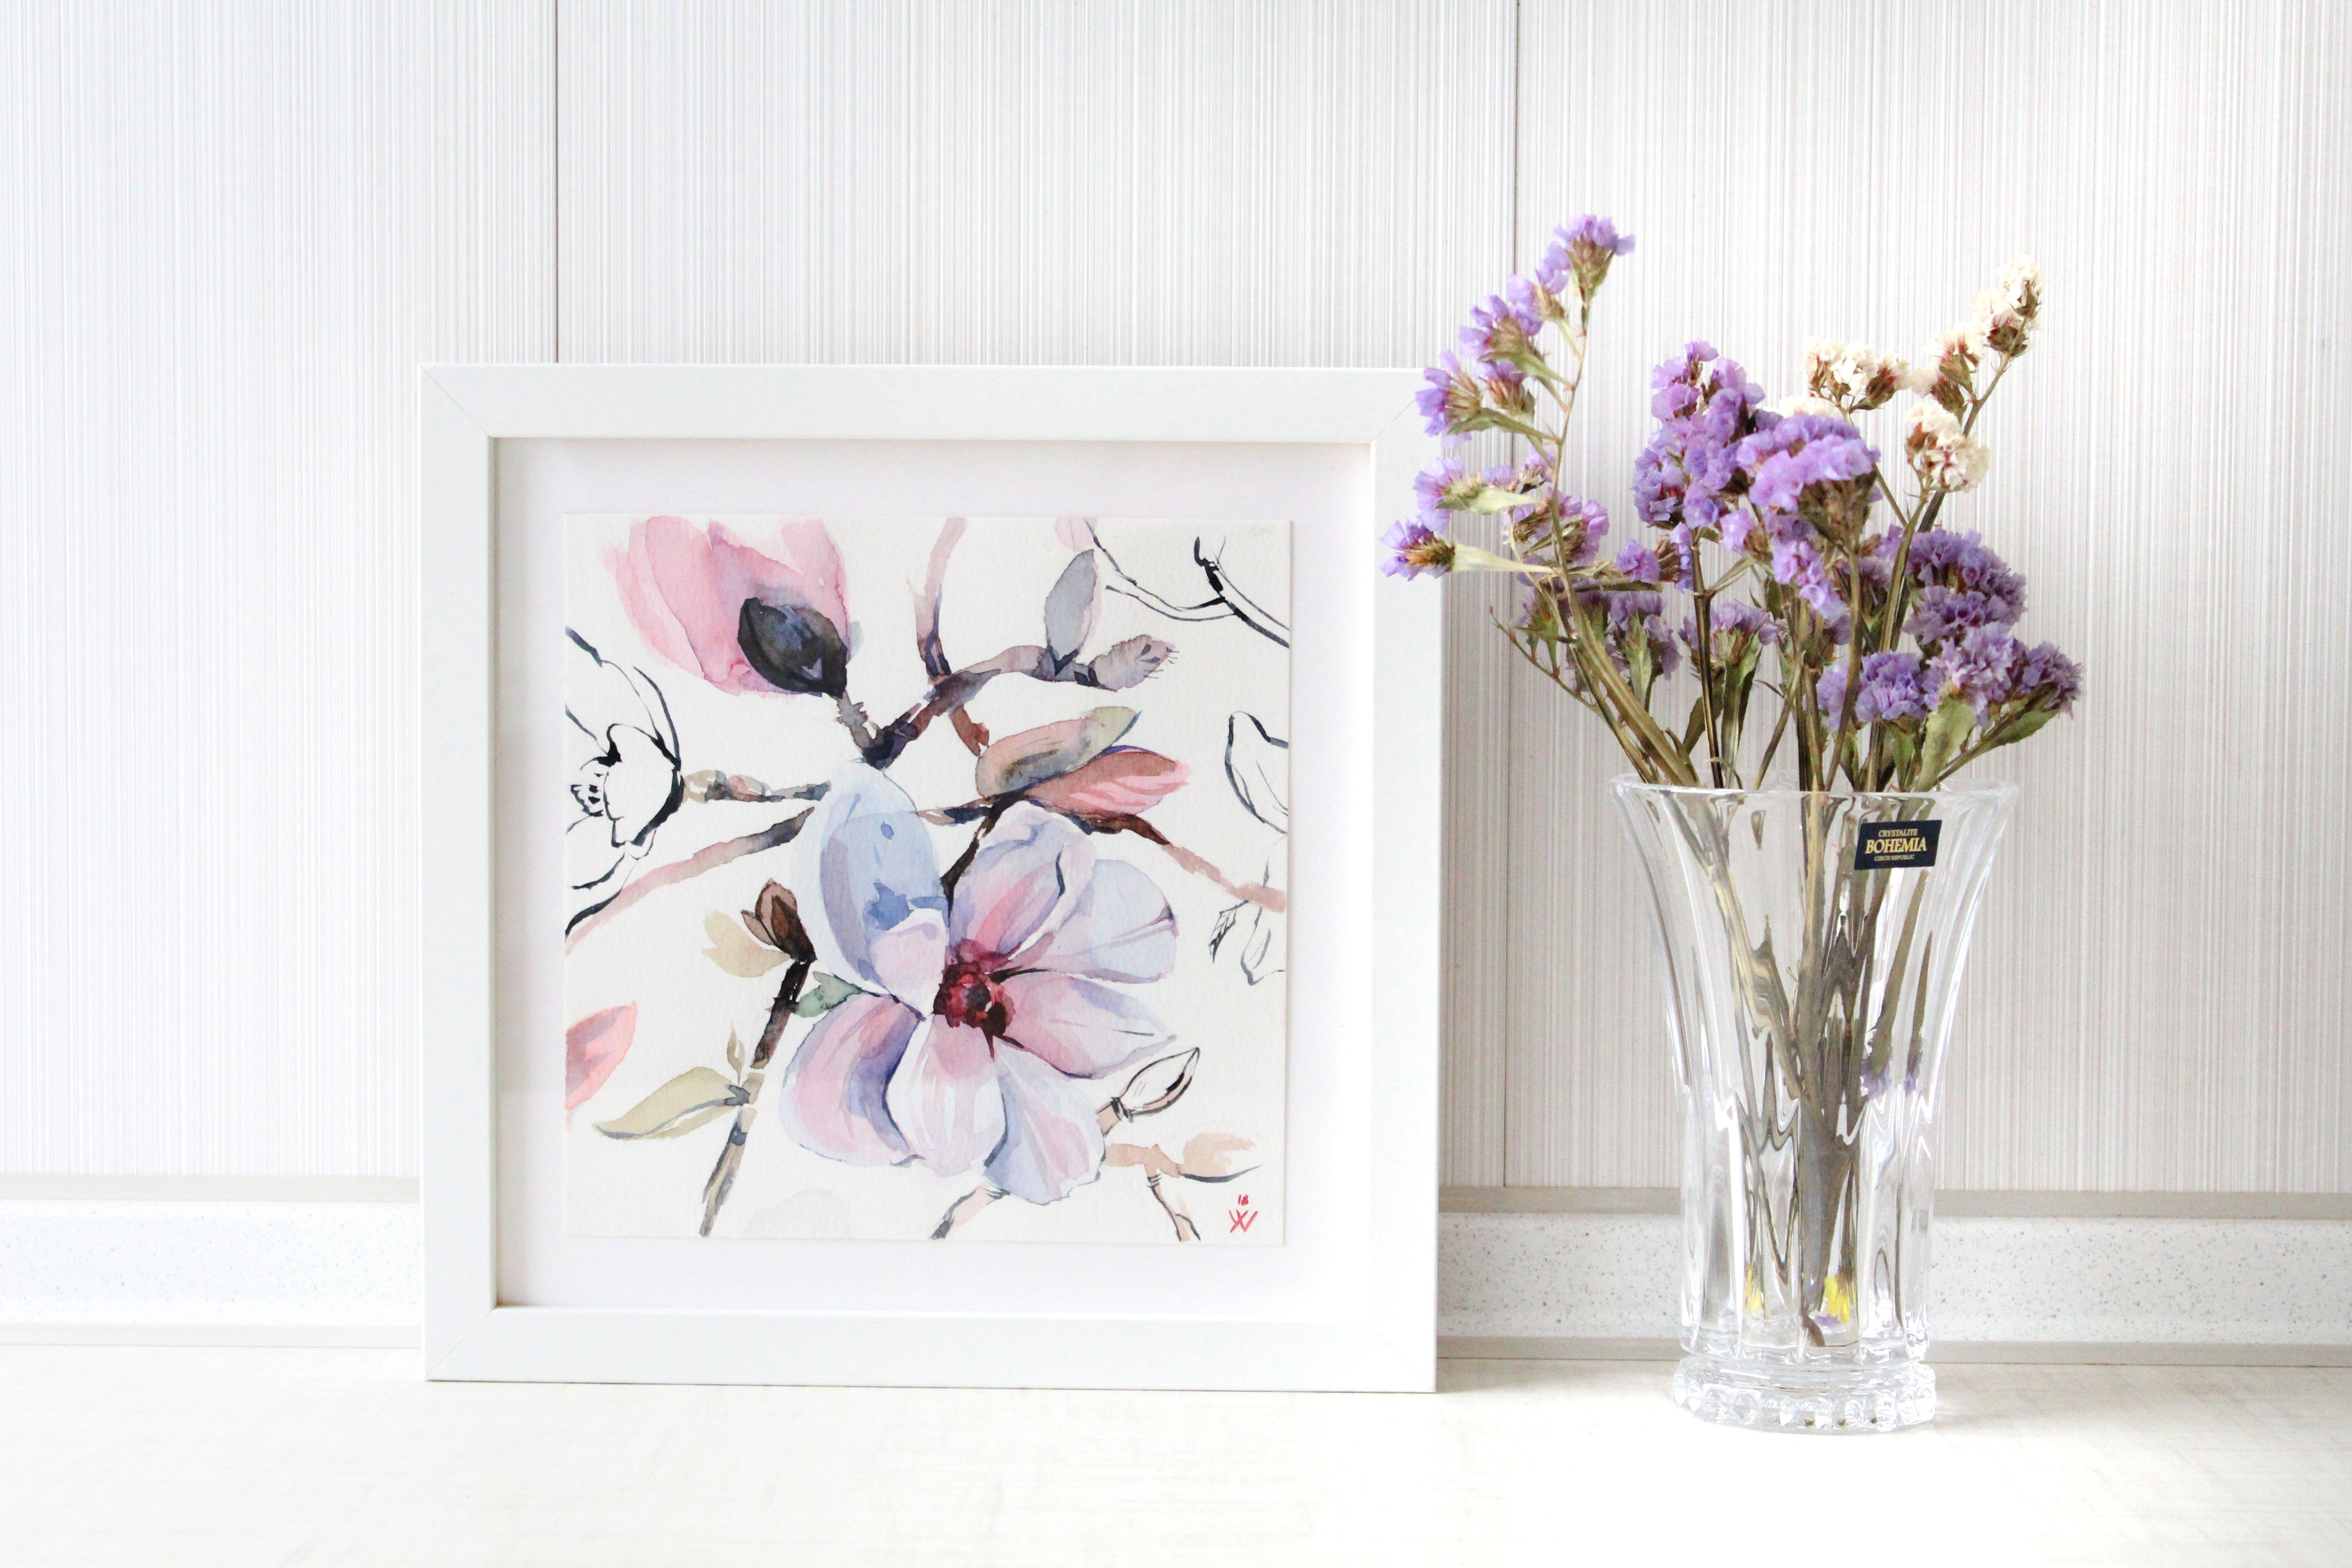 5184x3456 Blush Pink Watercolor Art, Blush Wall Art, Bedroom Wall Art